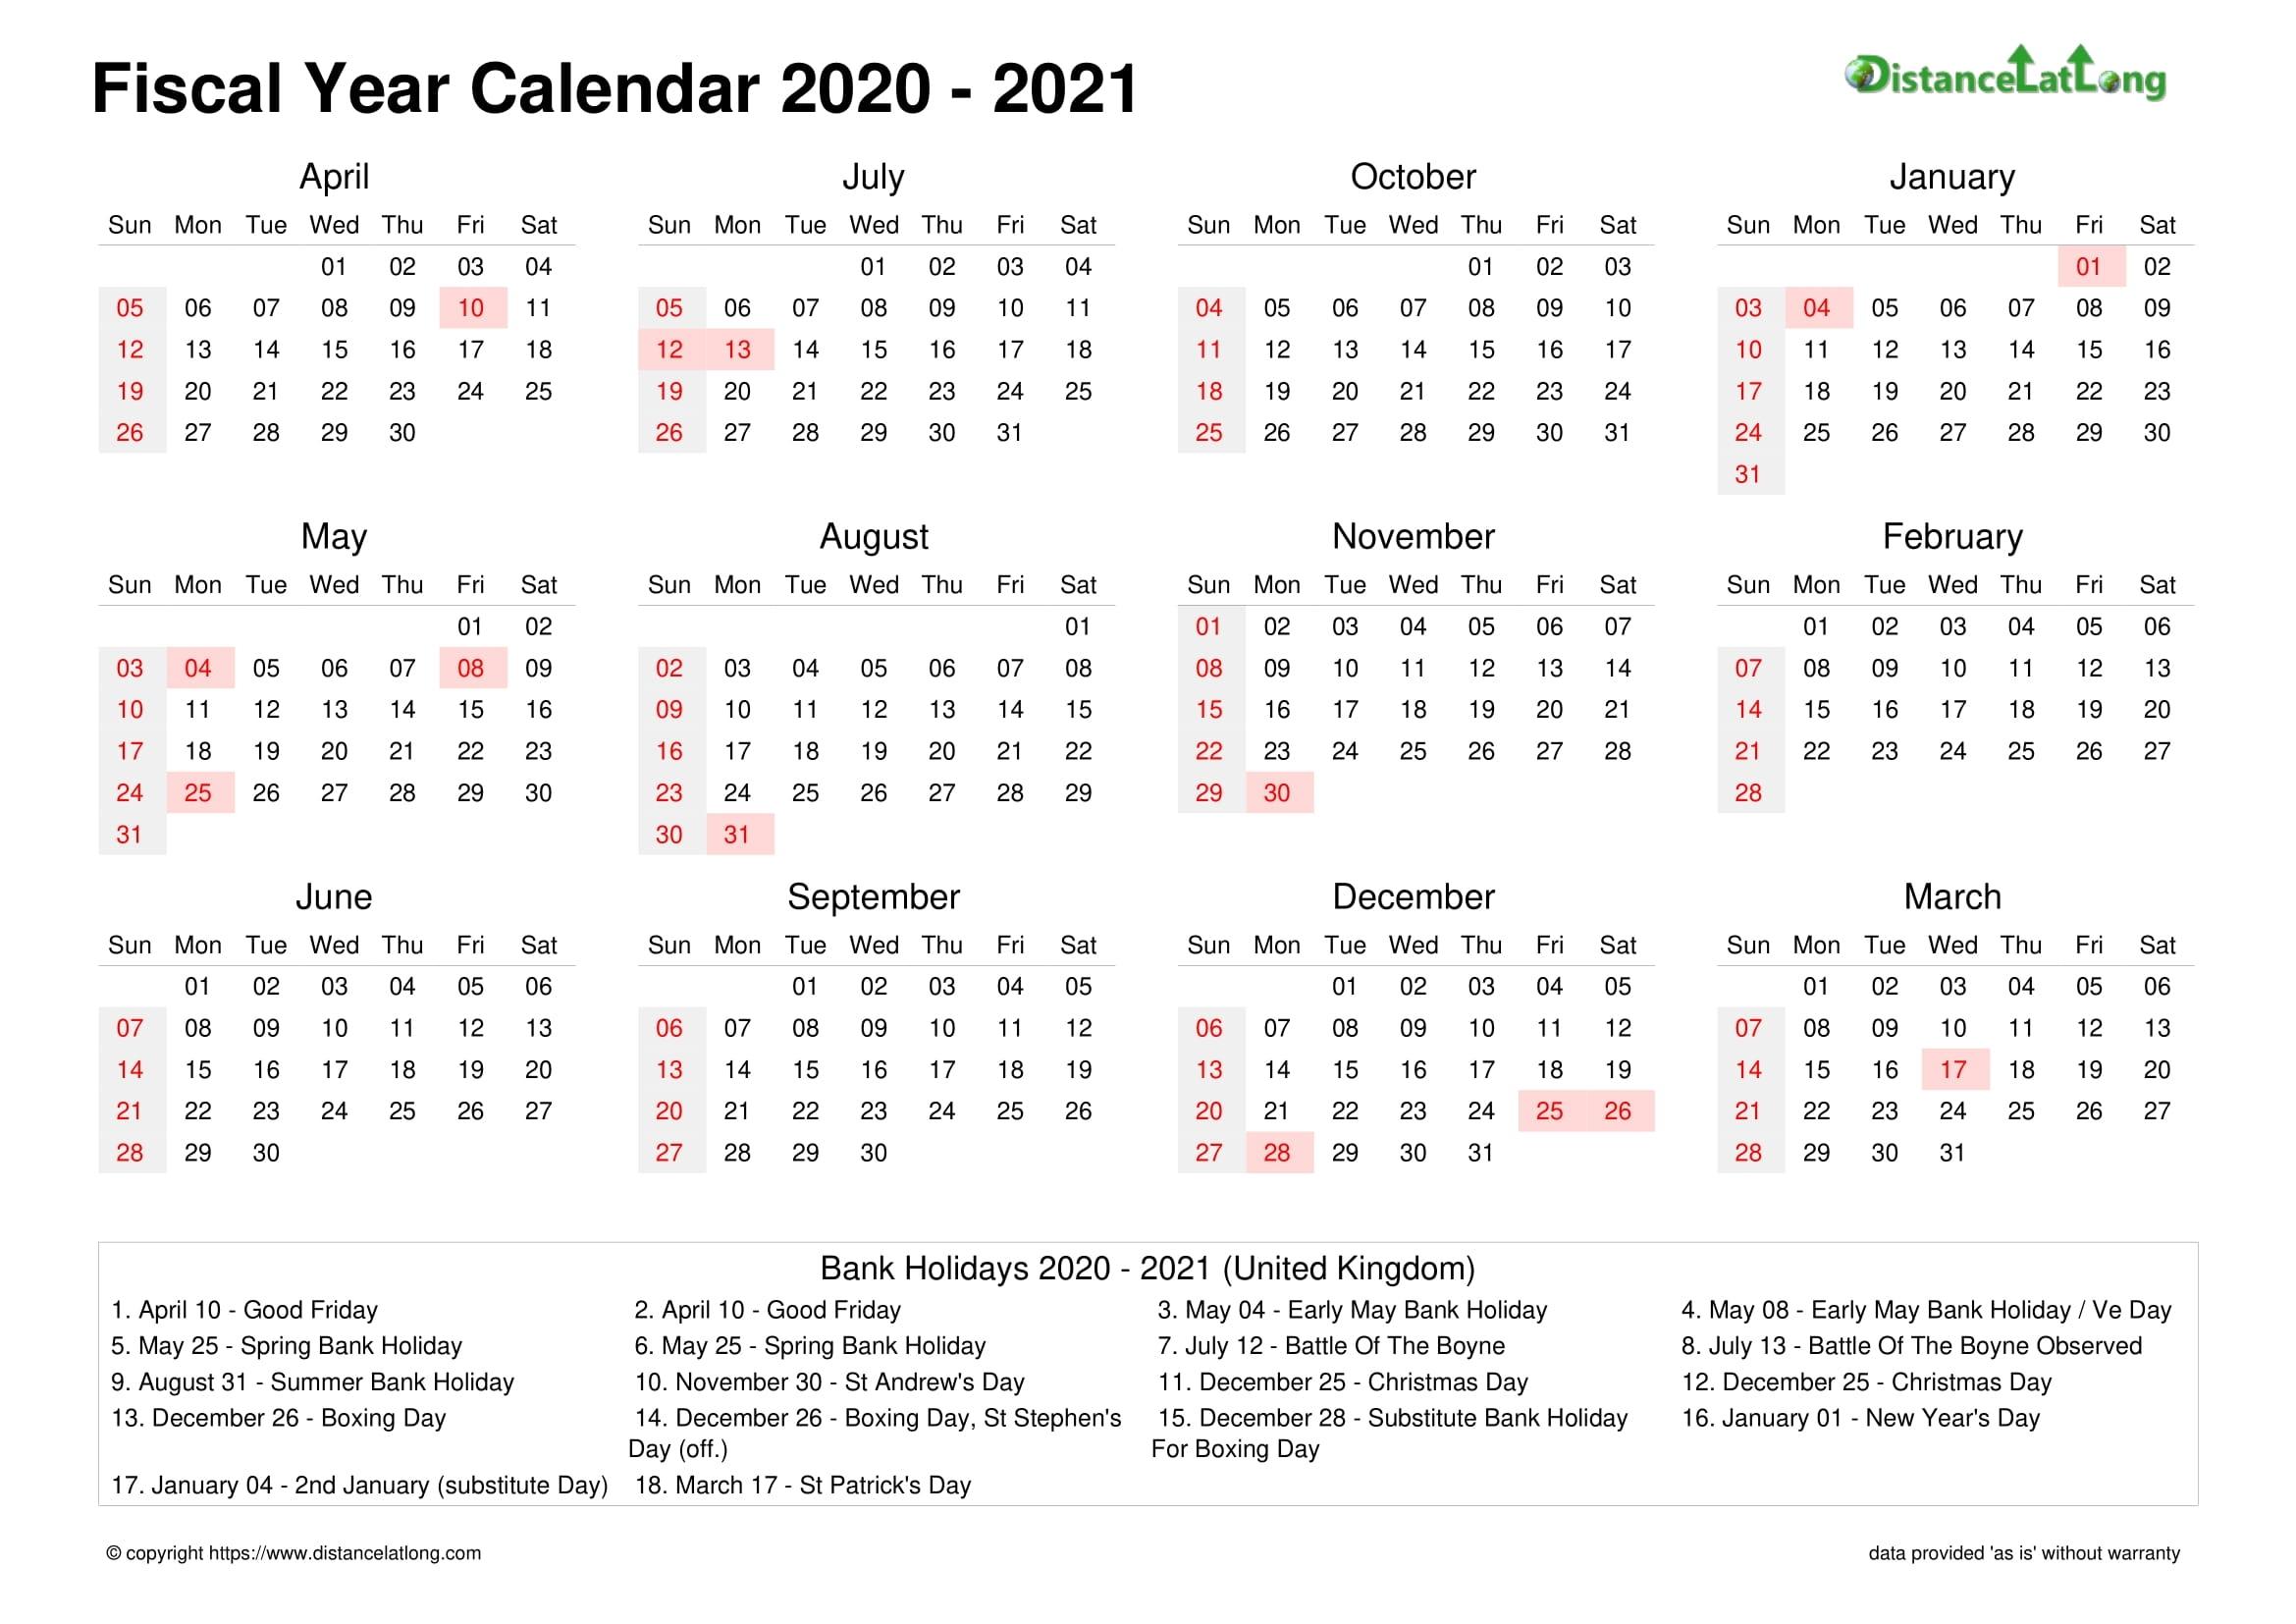 Fiscal Year 2020-2021 Calendar Templates, Free Printable